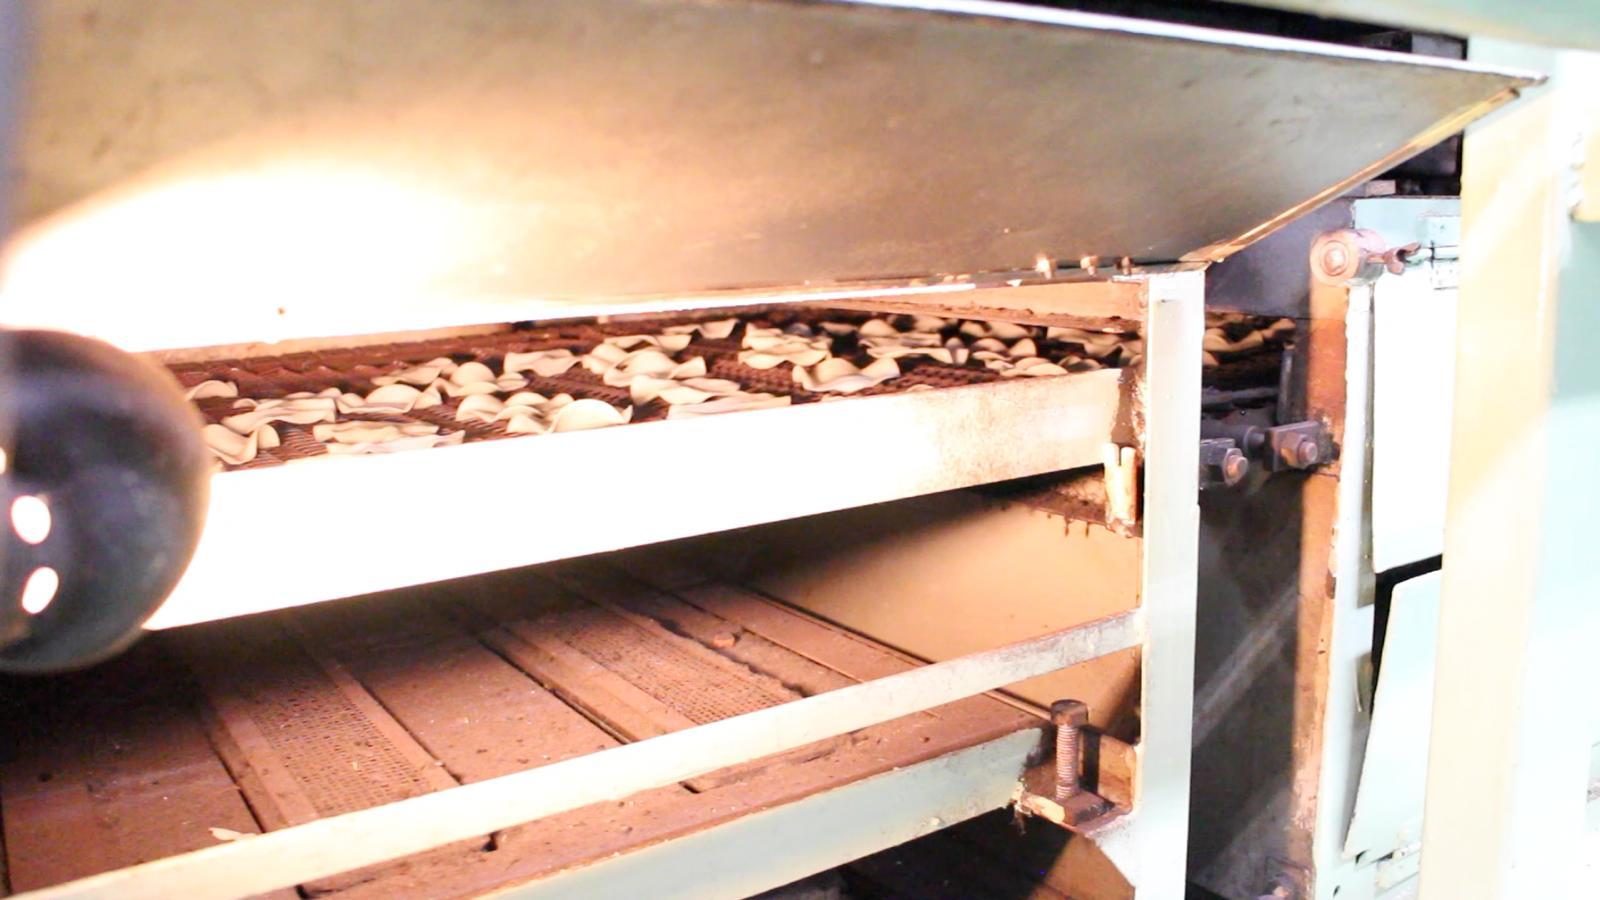 th_煎餅を焼く機械